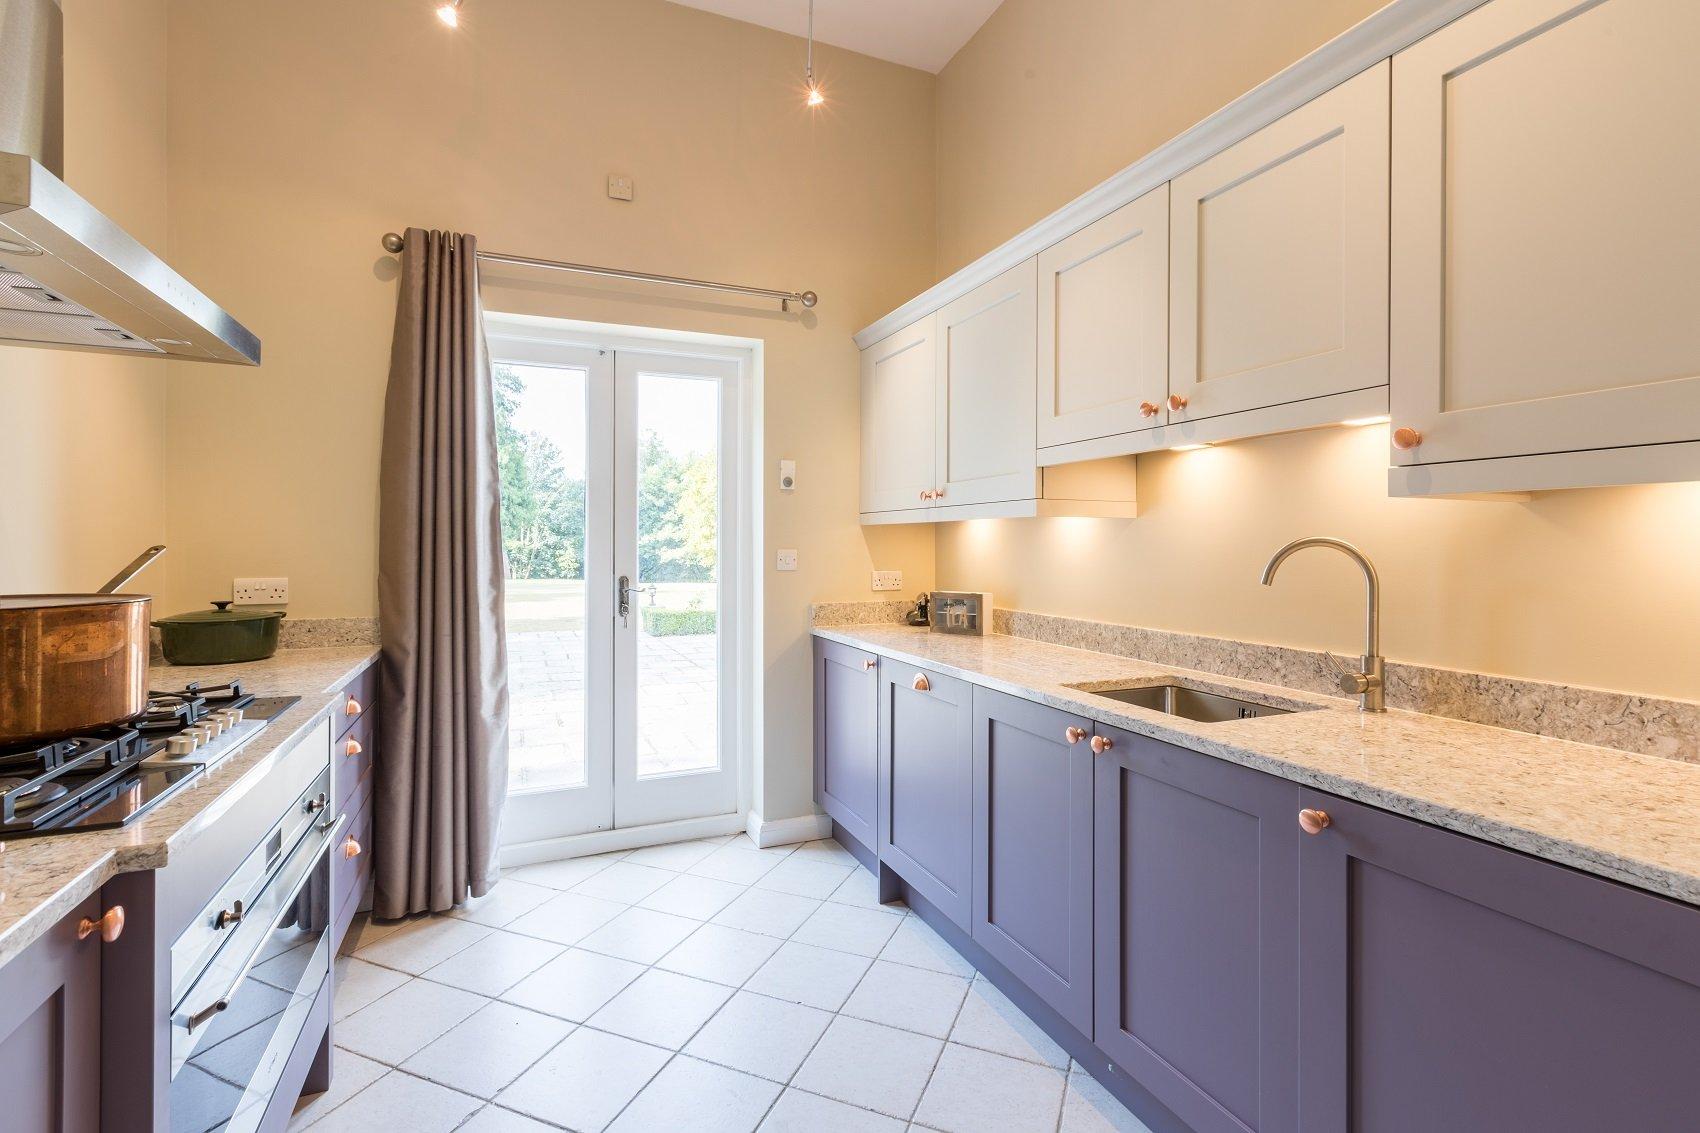 Annexe kitchen in mountain heather & light grey